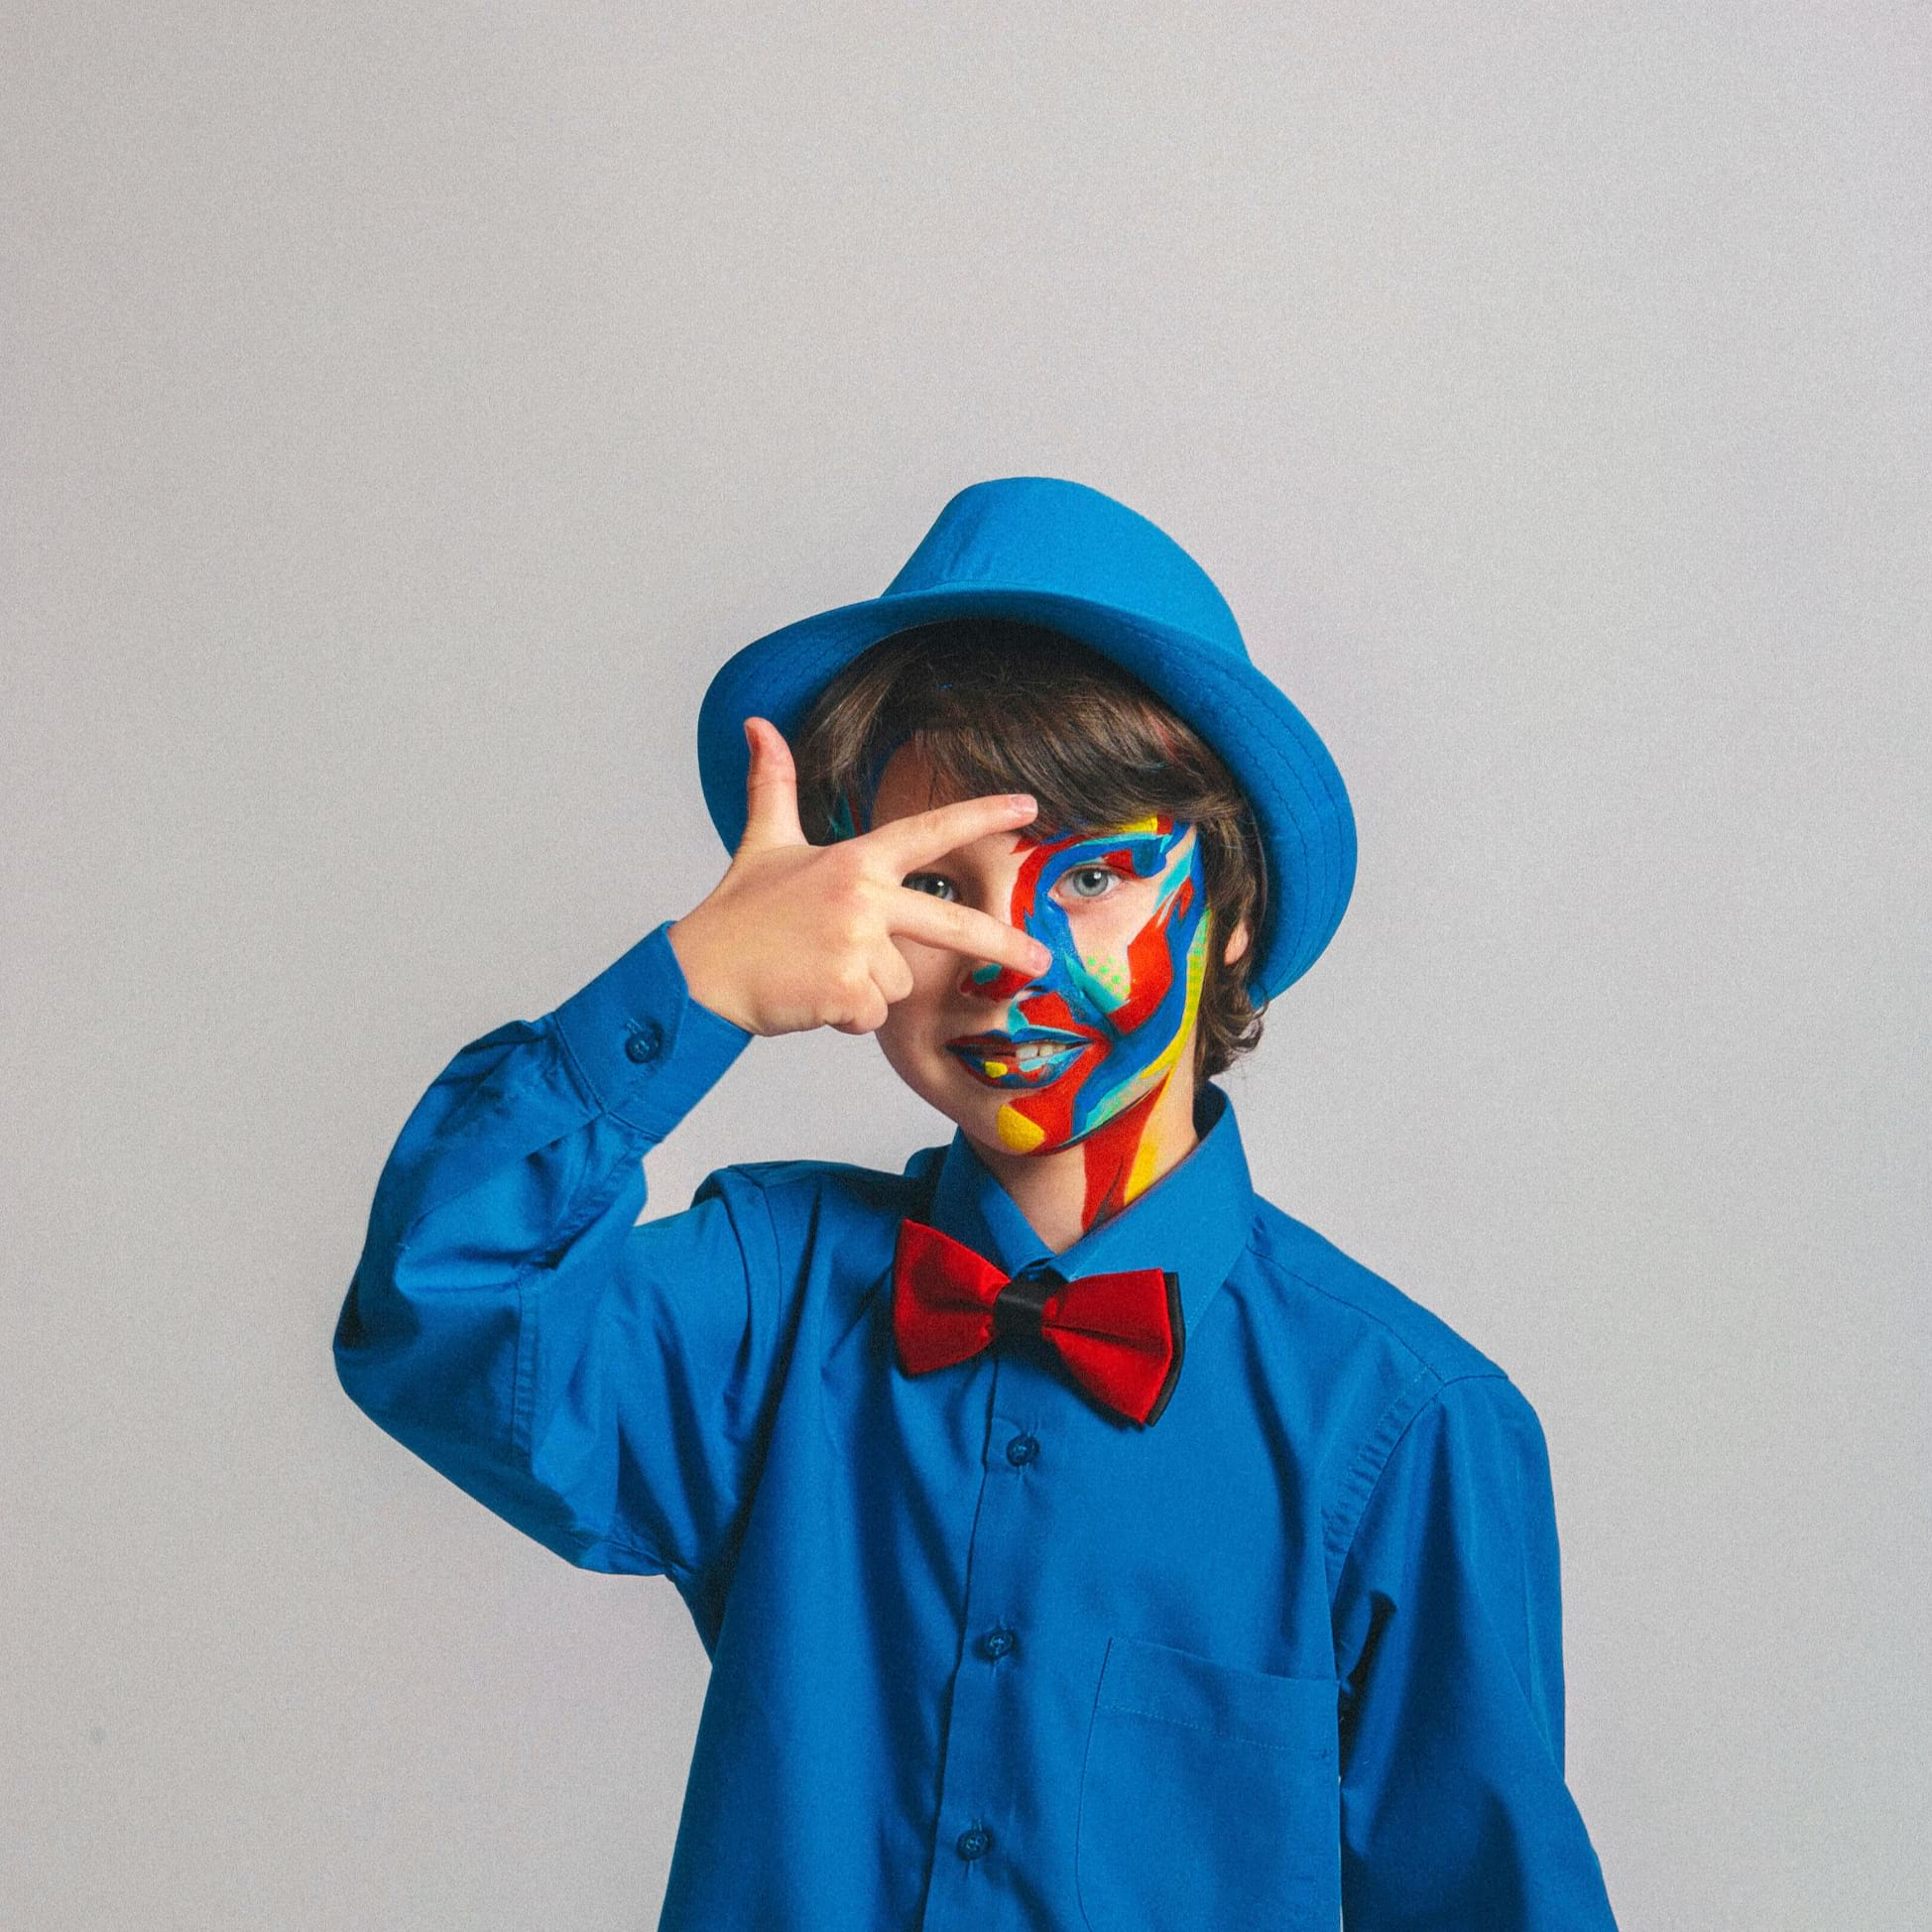 party-time-petreceri-copii-sibiu-pictura-pe-fata